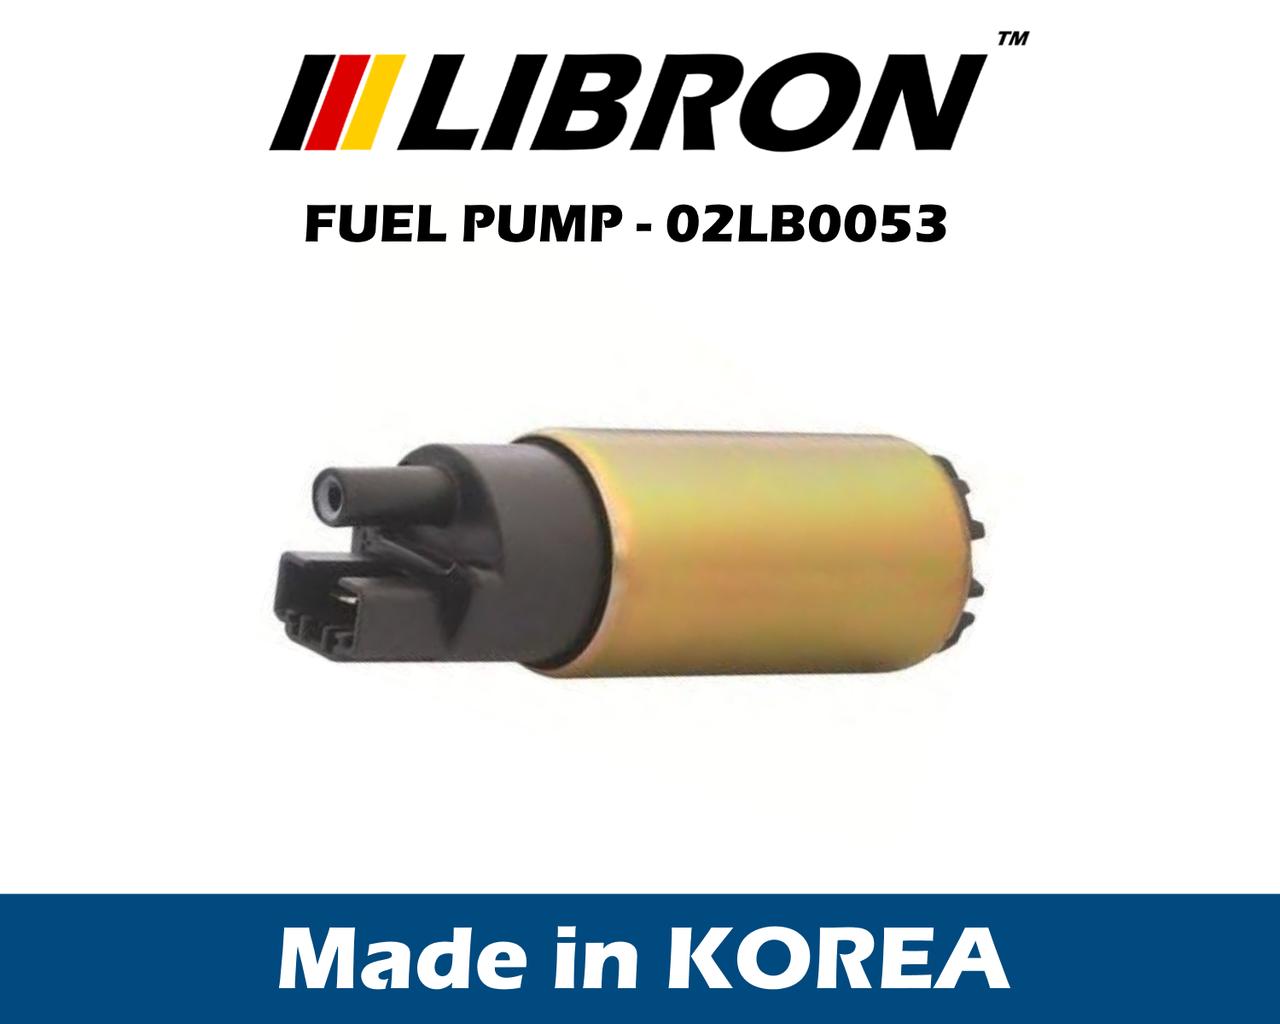 Бензонасос LIBRON 02LB0053 (аналог 0580453453 Bosch, MAM00006 Magneti Marelli) - Ваз Vaz